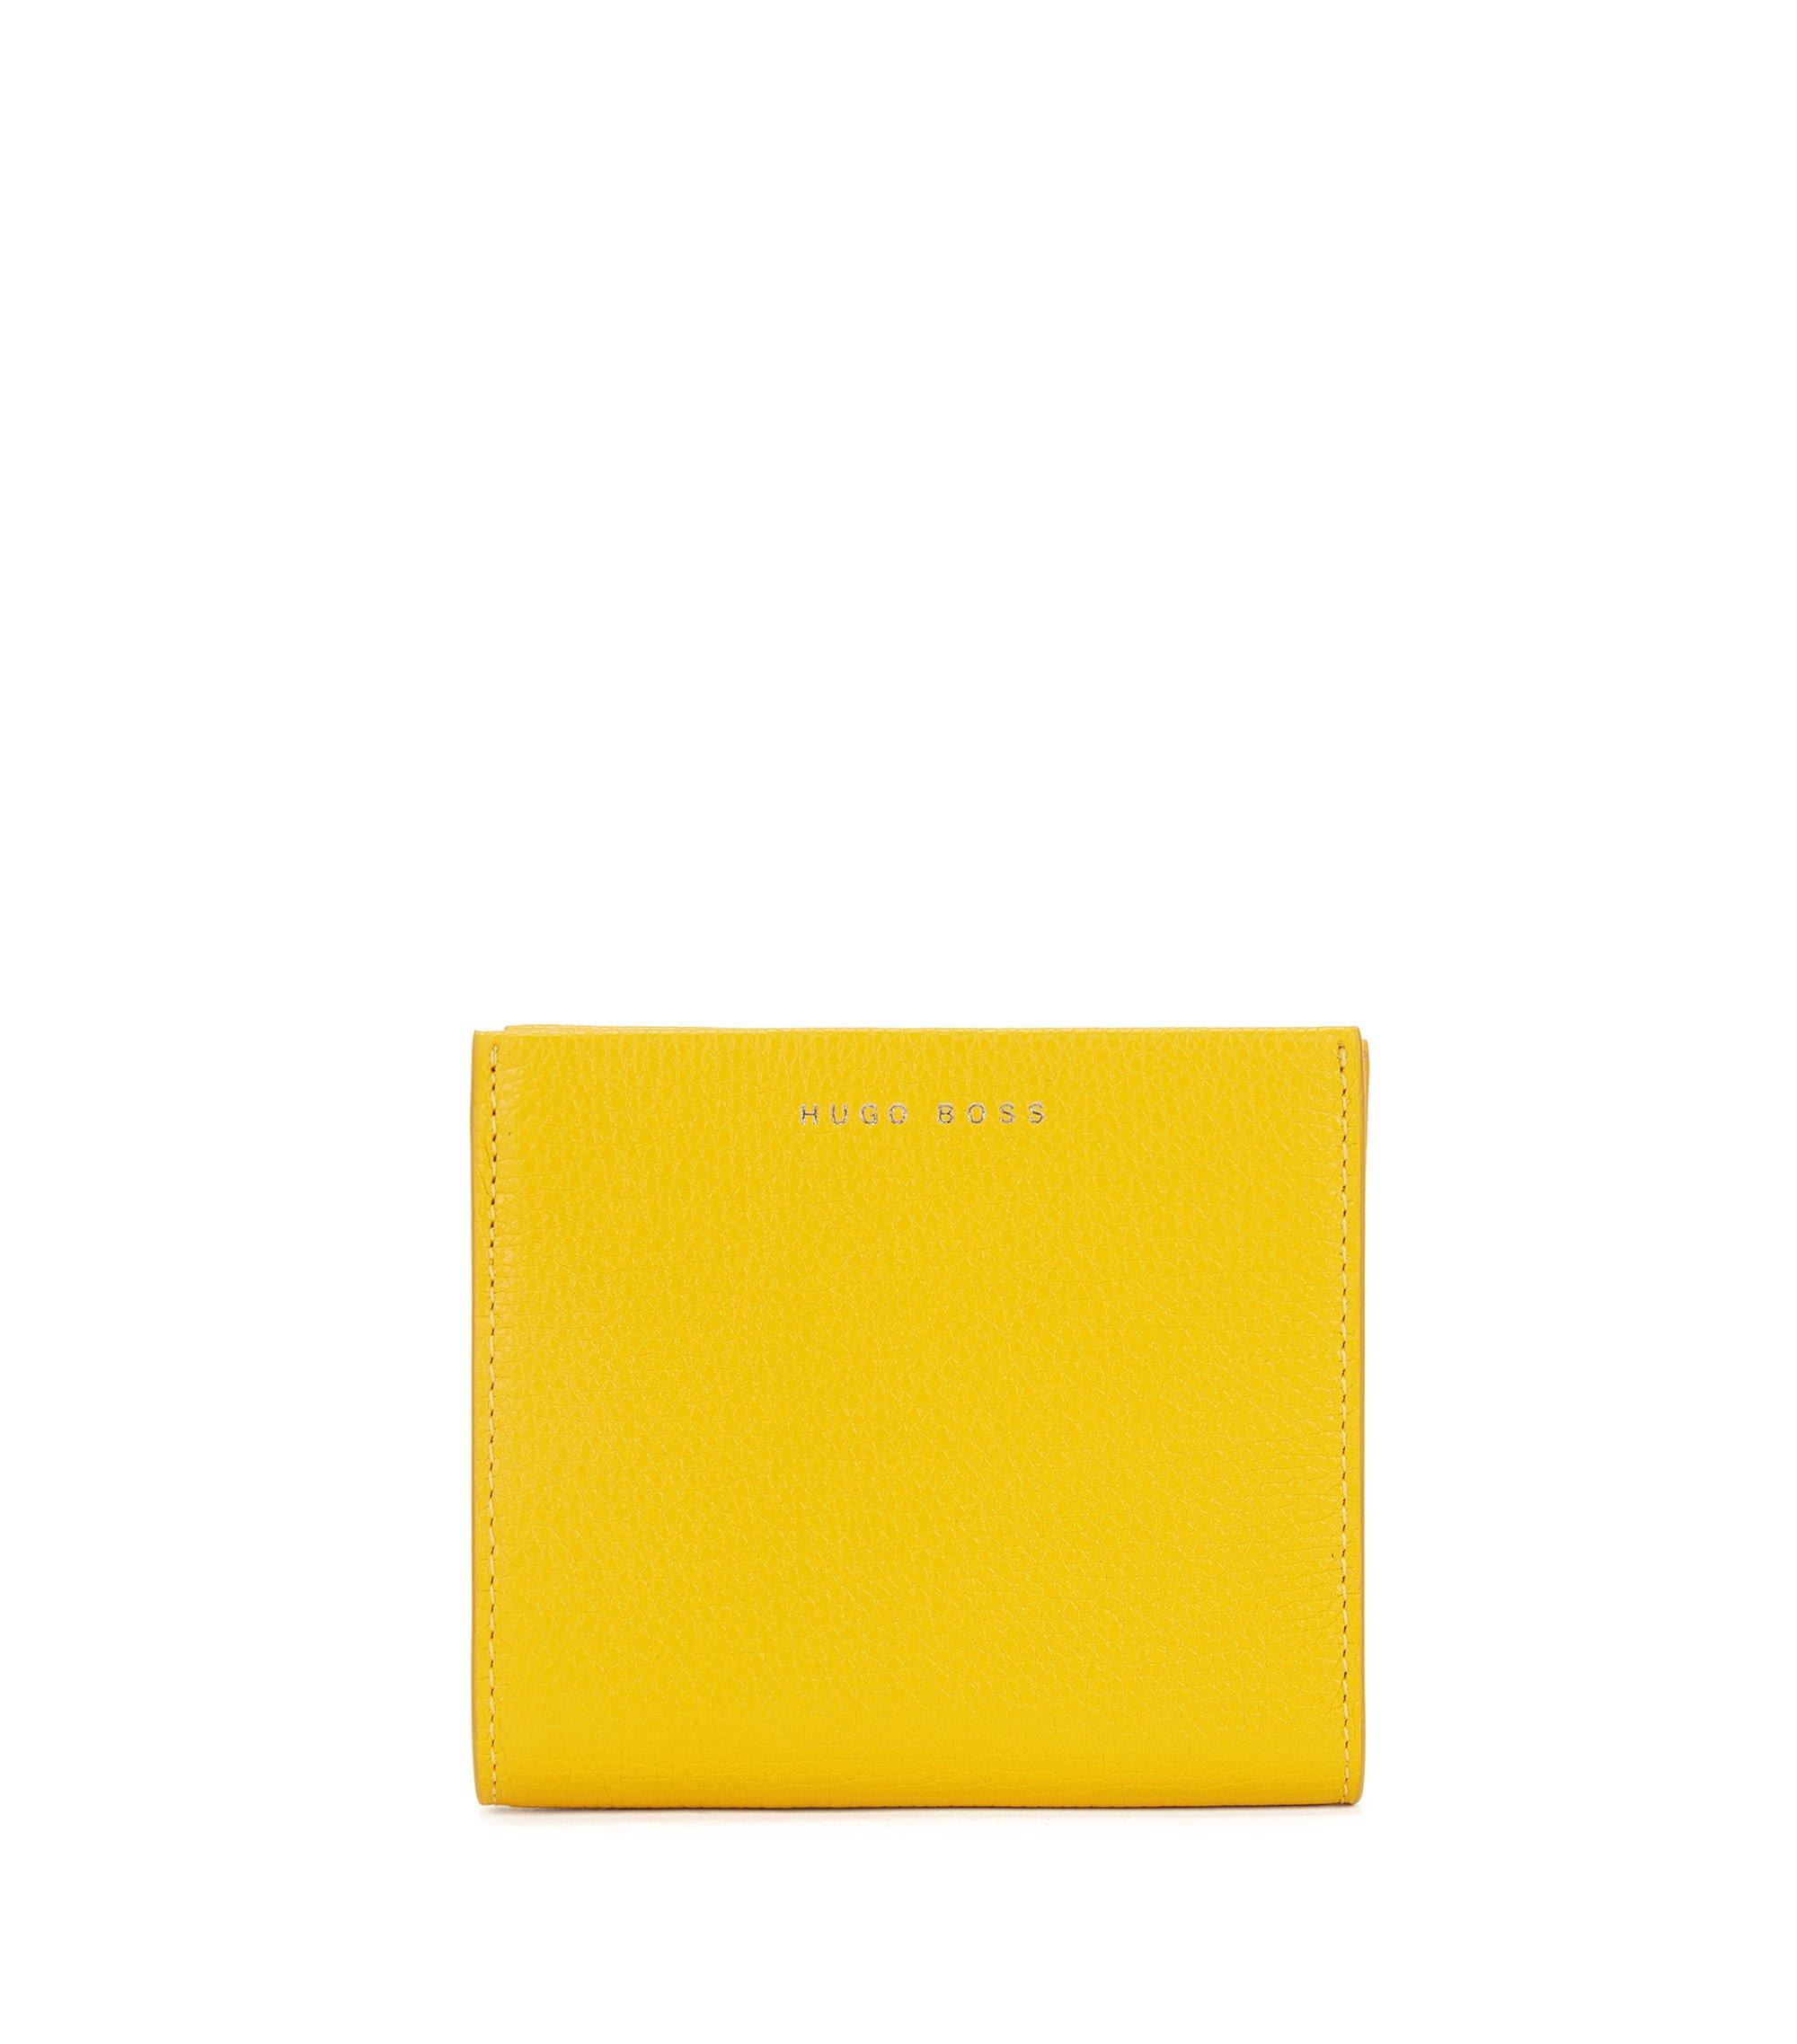 Kleine portemonnee van generfd Italiaans leer met ritssluiting rondom, Geel